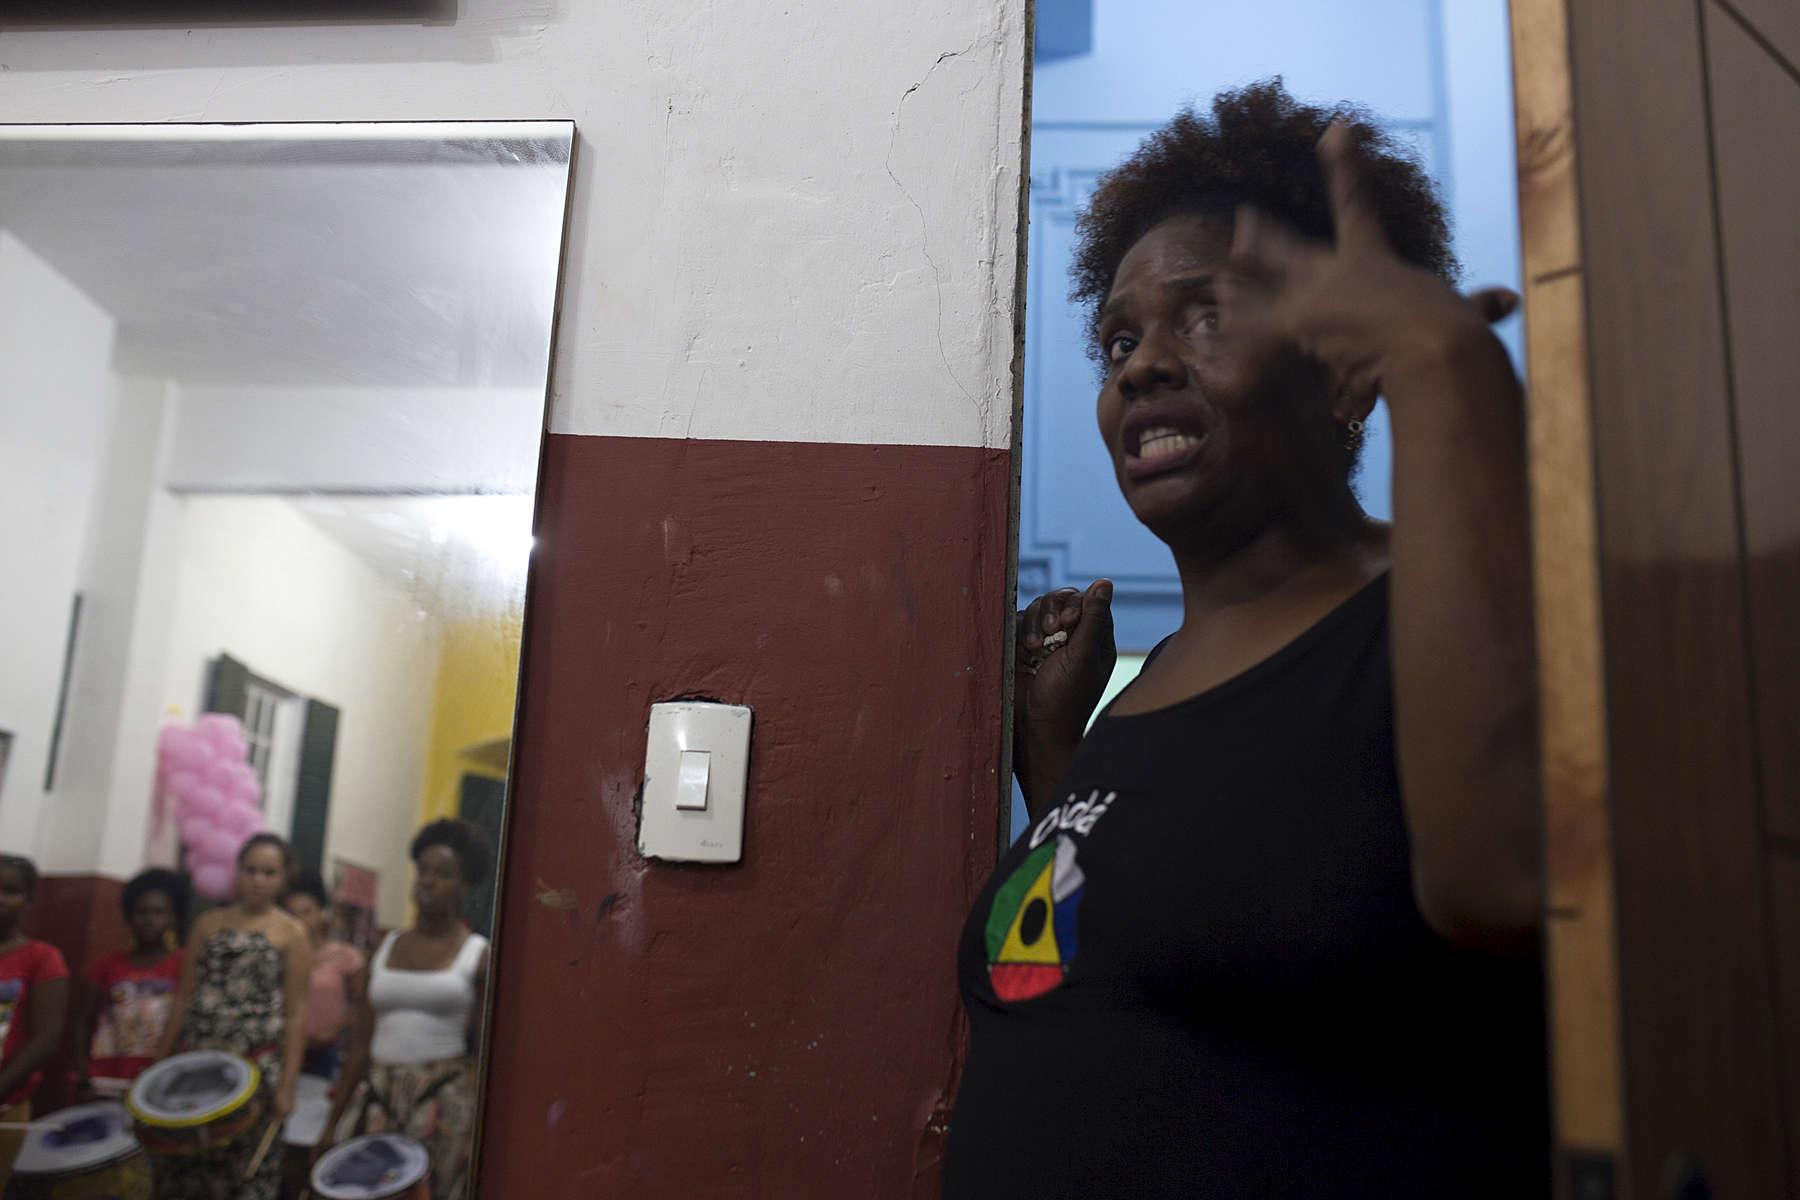 Deborah Souza, daughter of Didá founder Neguinho do Samba, talks to band members during practice at Project Didá in Salvador's historic neighborhood, Pelourinho.